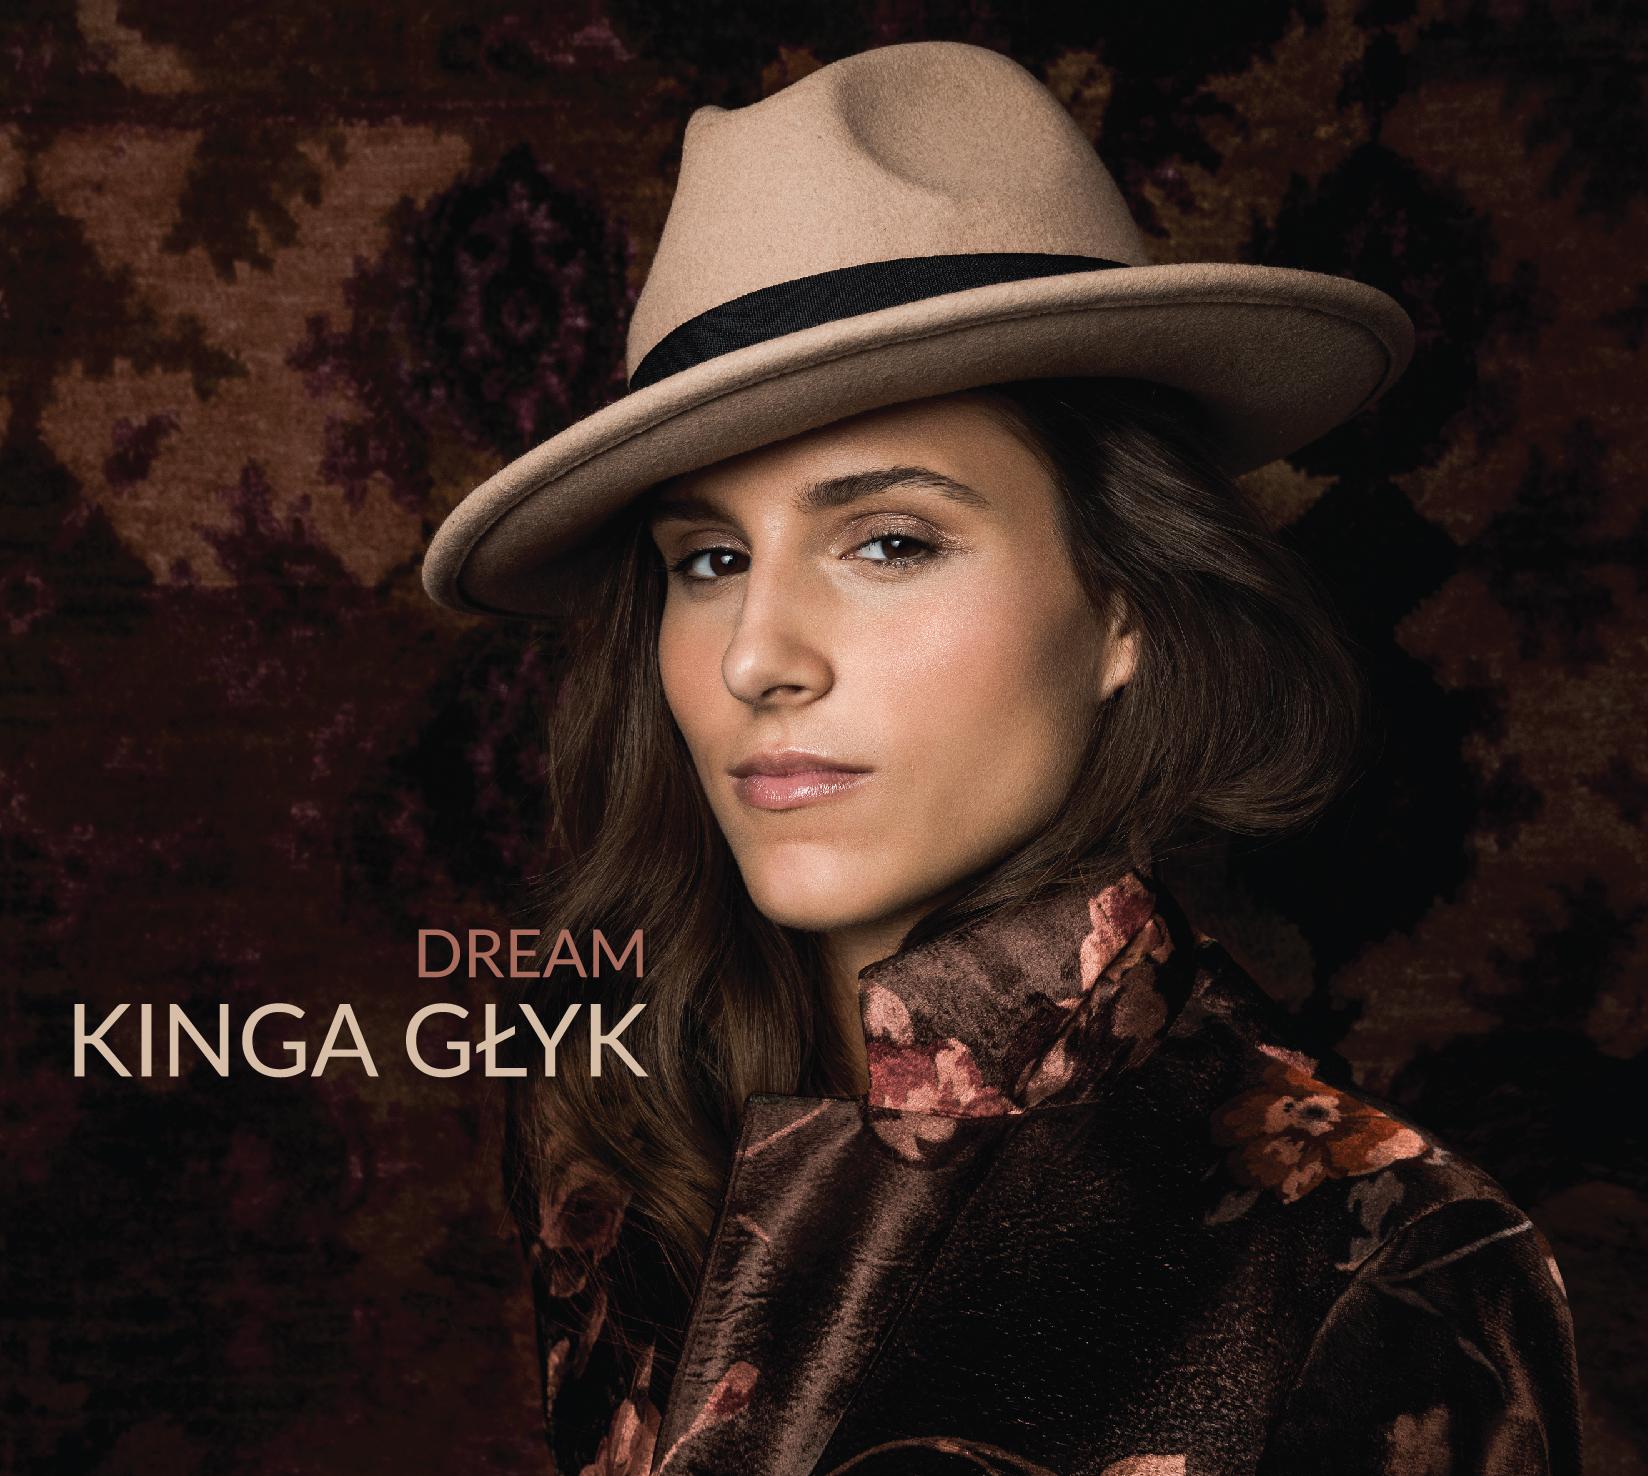 Kinga Glyk</br>Dream</br>Warner, 2017